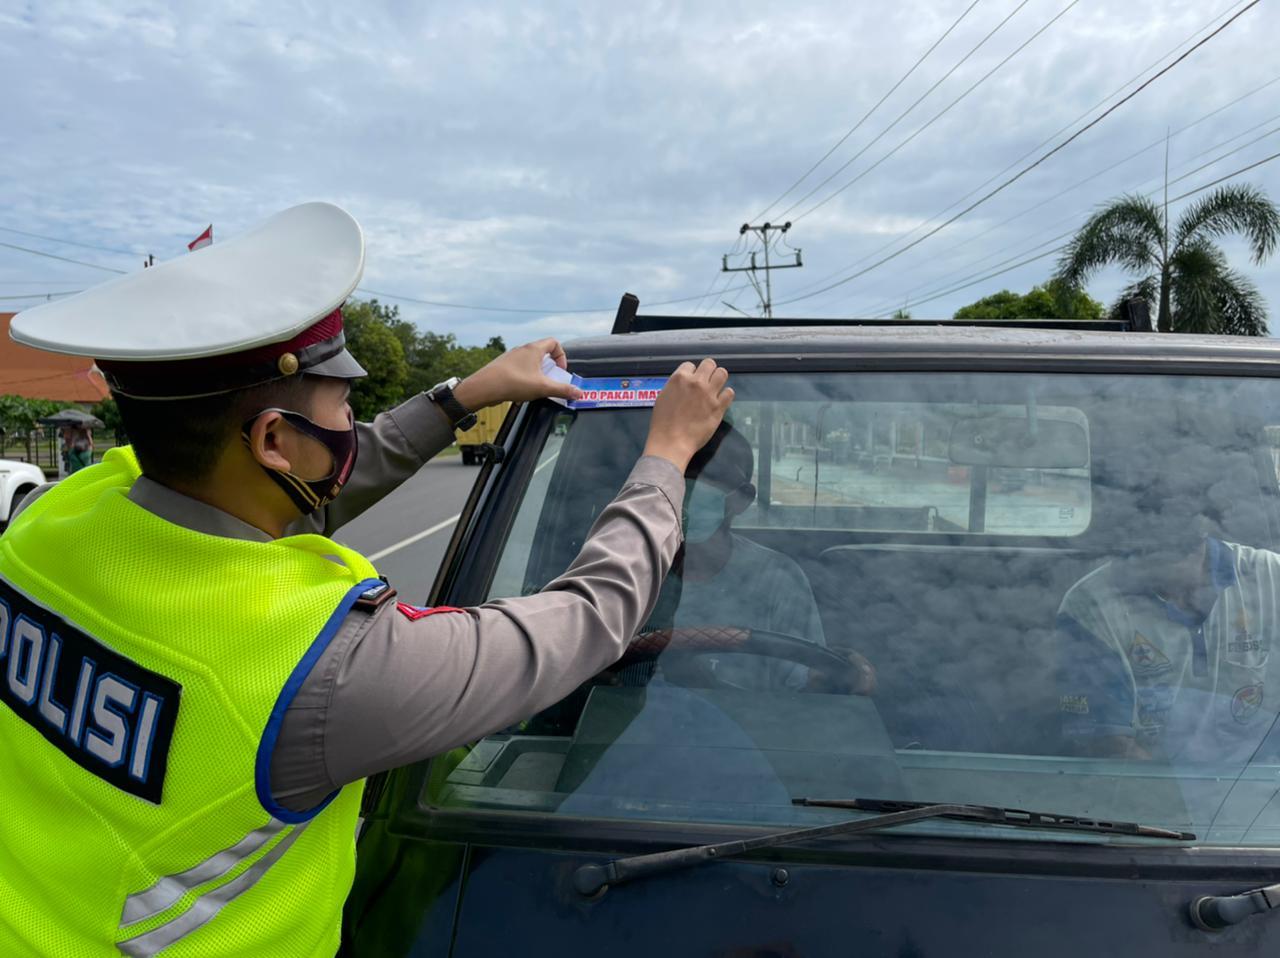 Satlantas Polres Ketapang Sebar Brosur, dan Sticker Tentang Pesan – pesan keselamatan Berlalu lintas